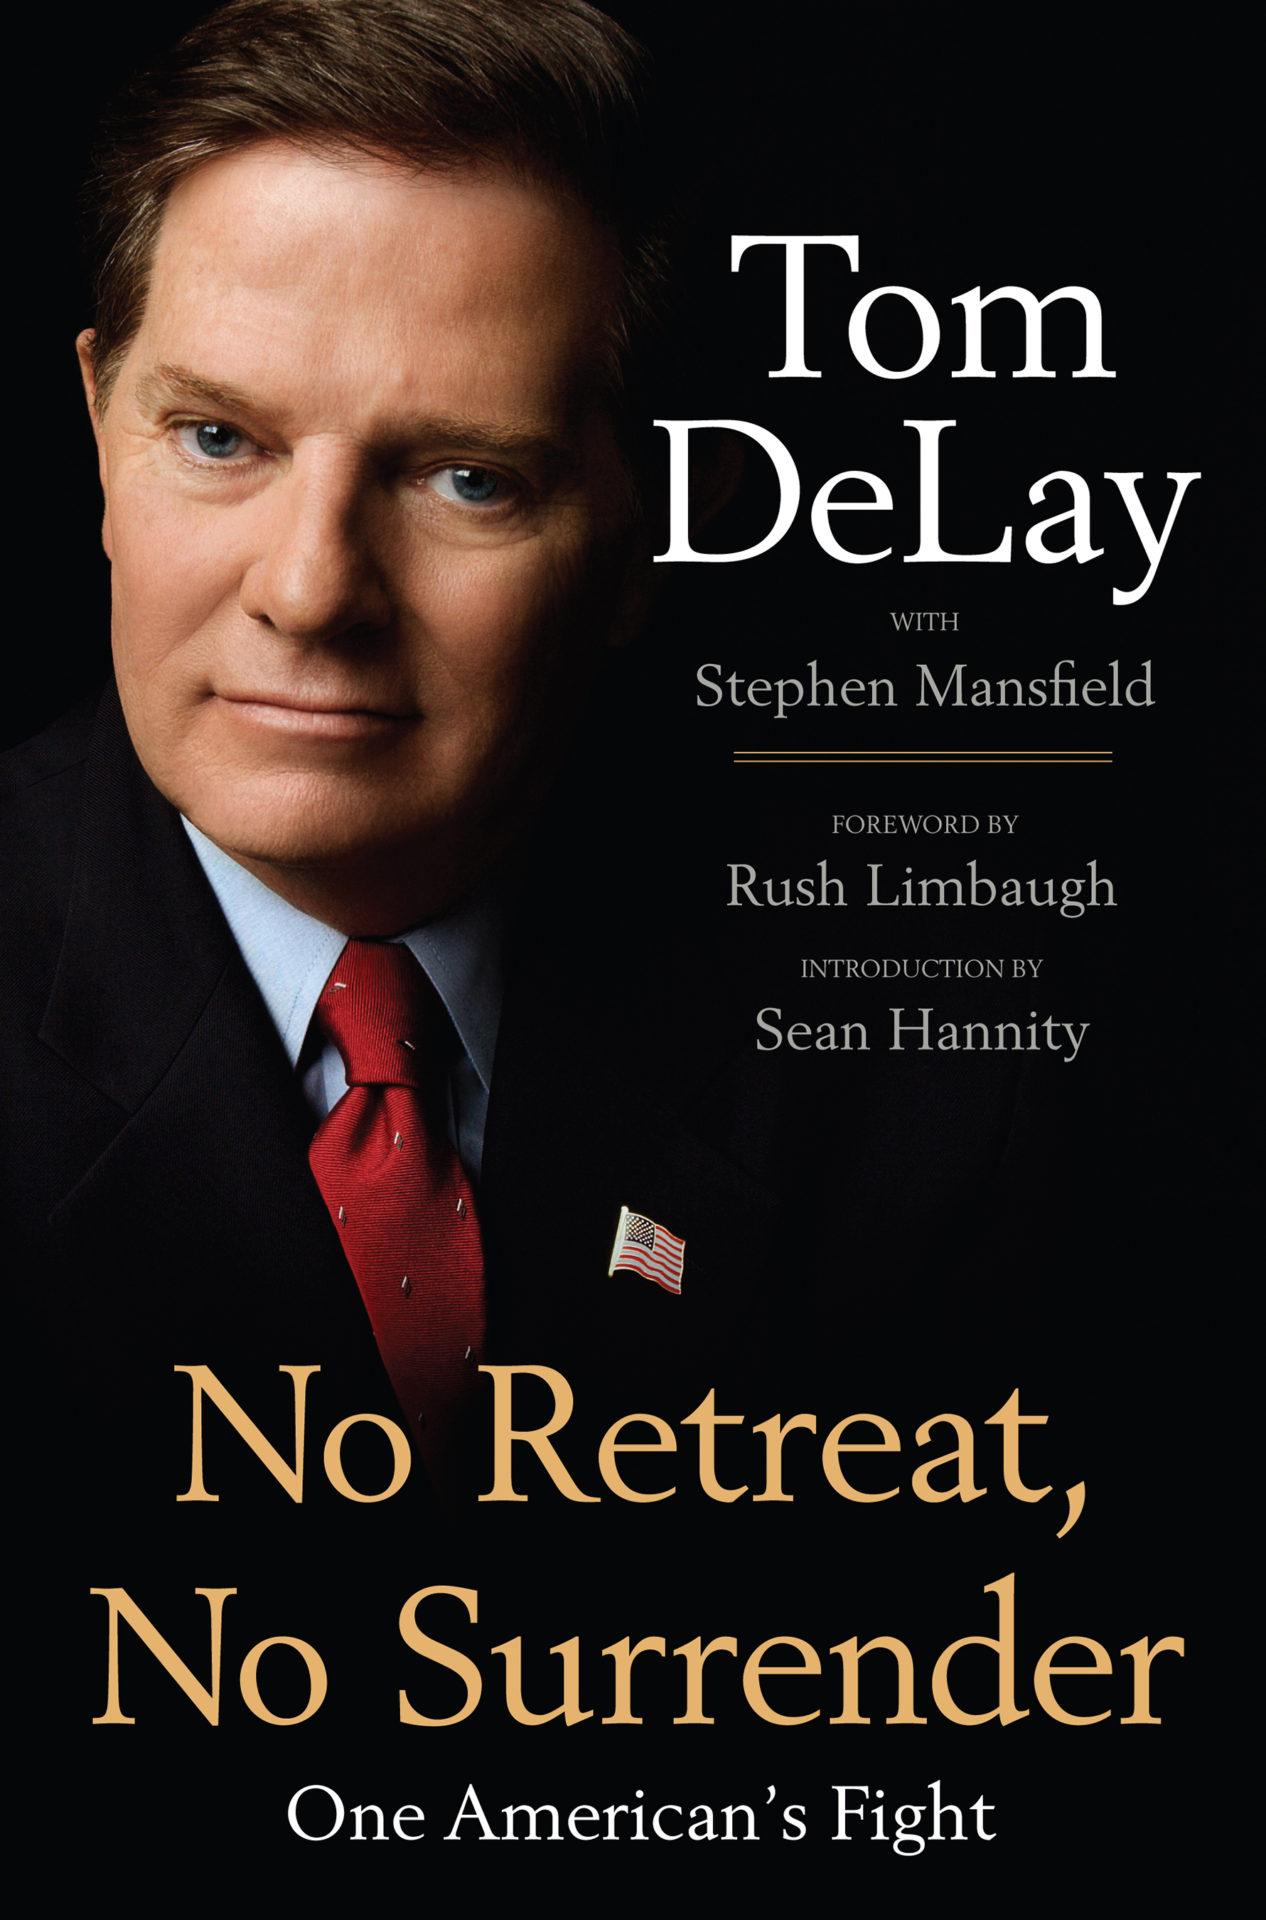 Tom Delay